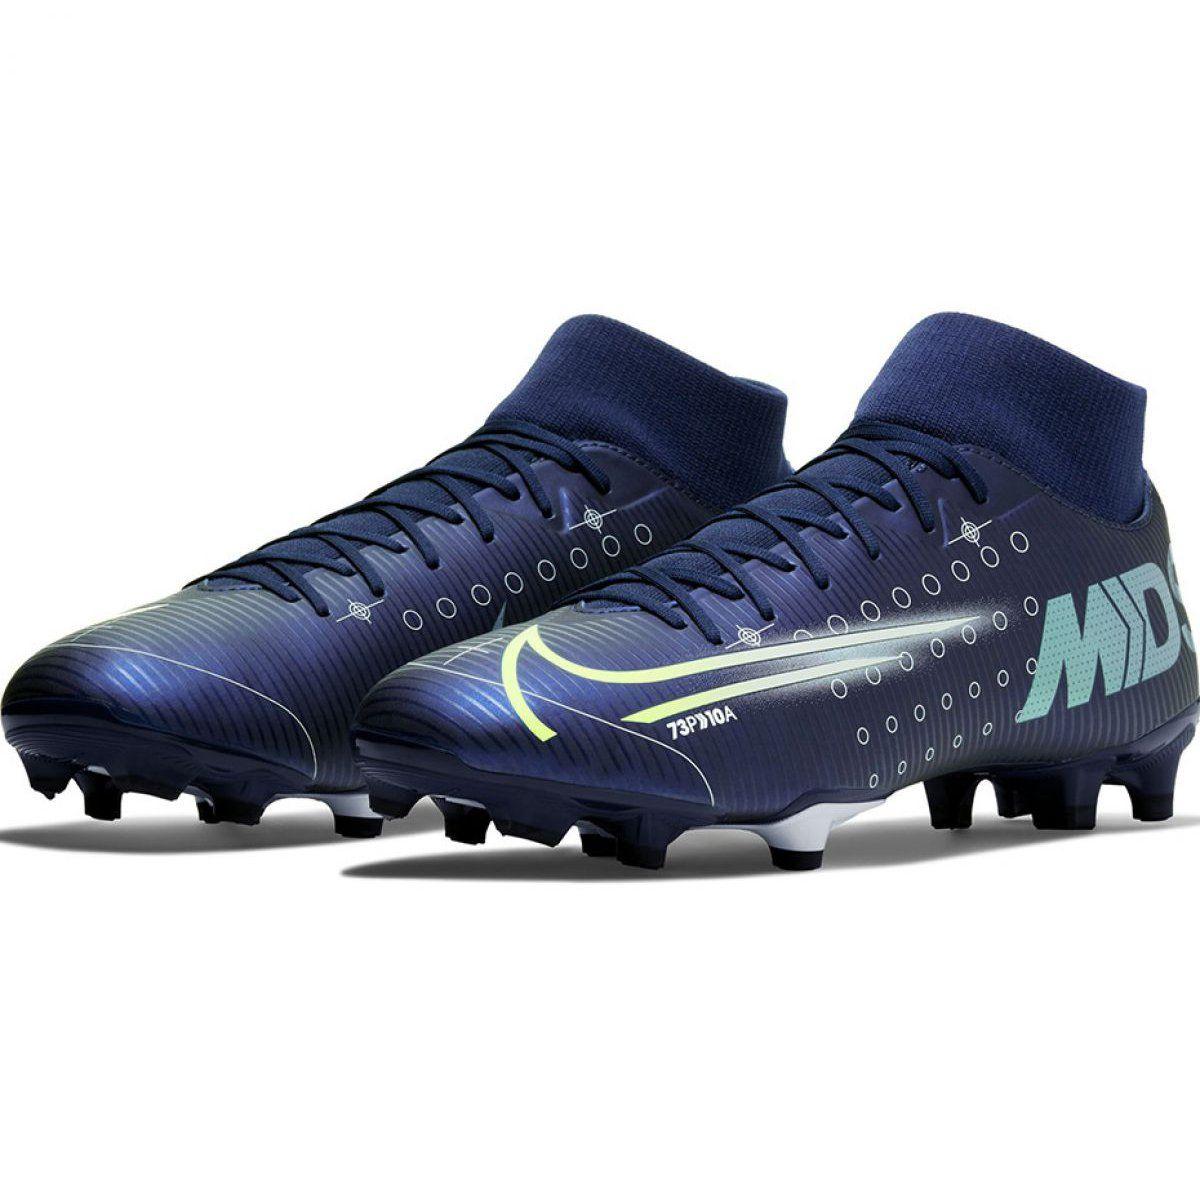 Buty Pilkarskie Nike Mercurial Superfly 7 Academy Mds Fg Mg M Bq5427 401 Niebieskie Niebieskie Football Boots Mens Football Boots Football Shoes